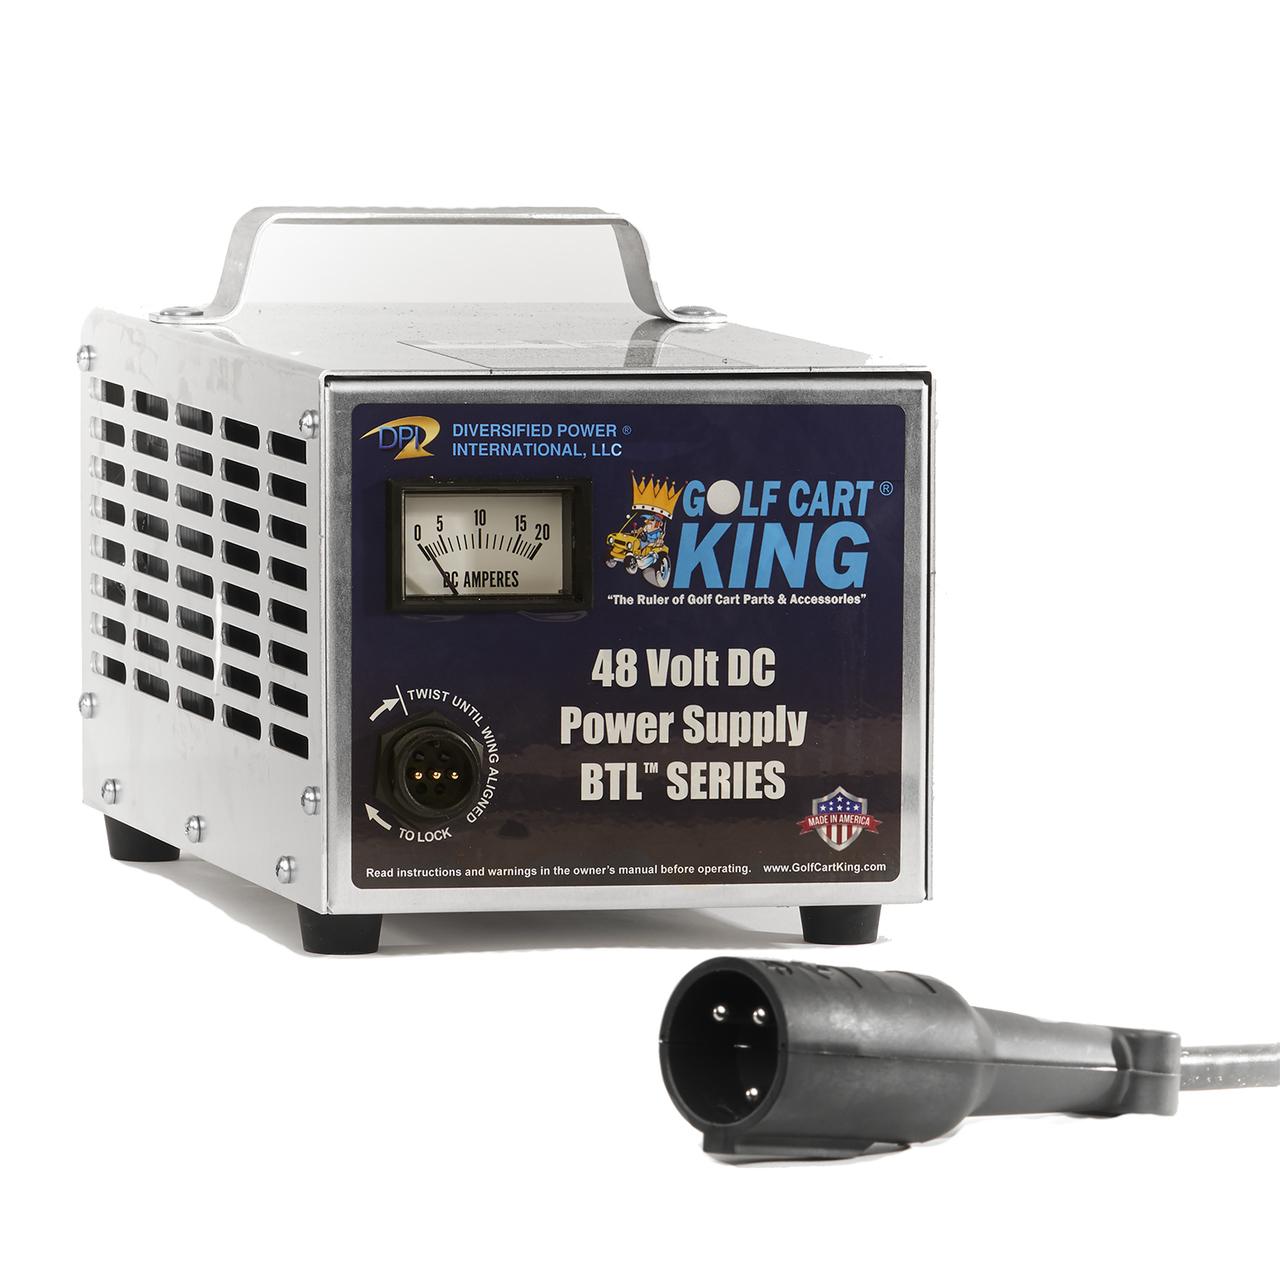 club car dpi charger 48v 15a powerdrive iq 3 pin round handle  [ 1280 x 1280 Pixel ]